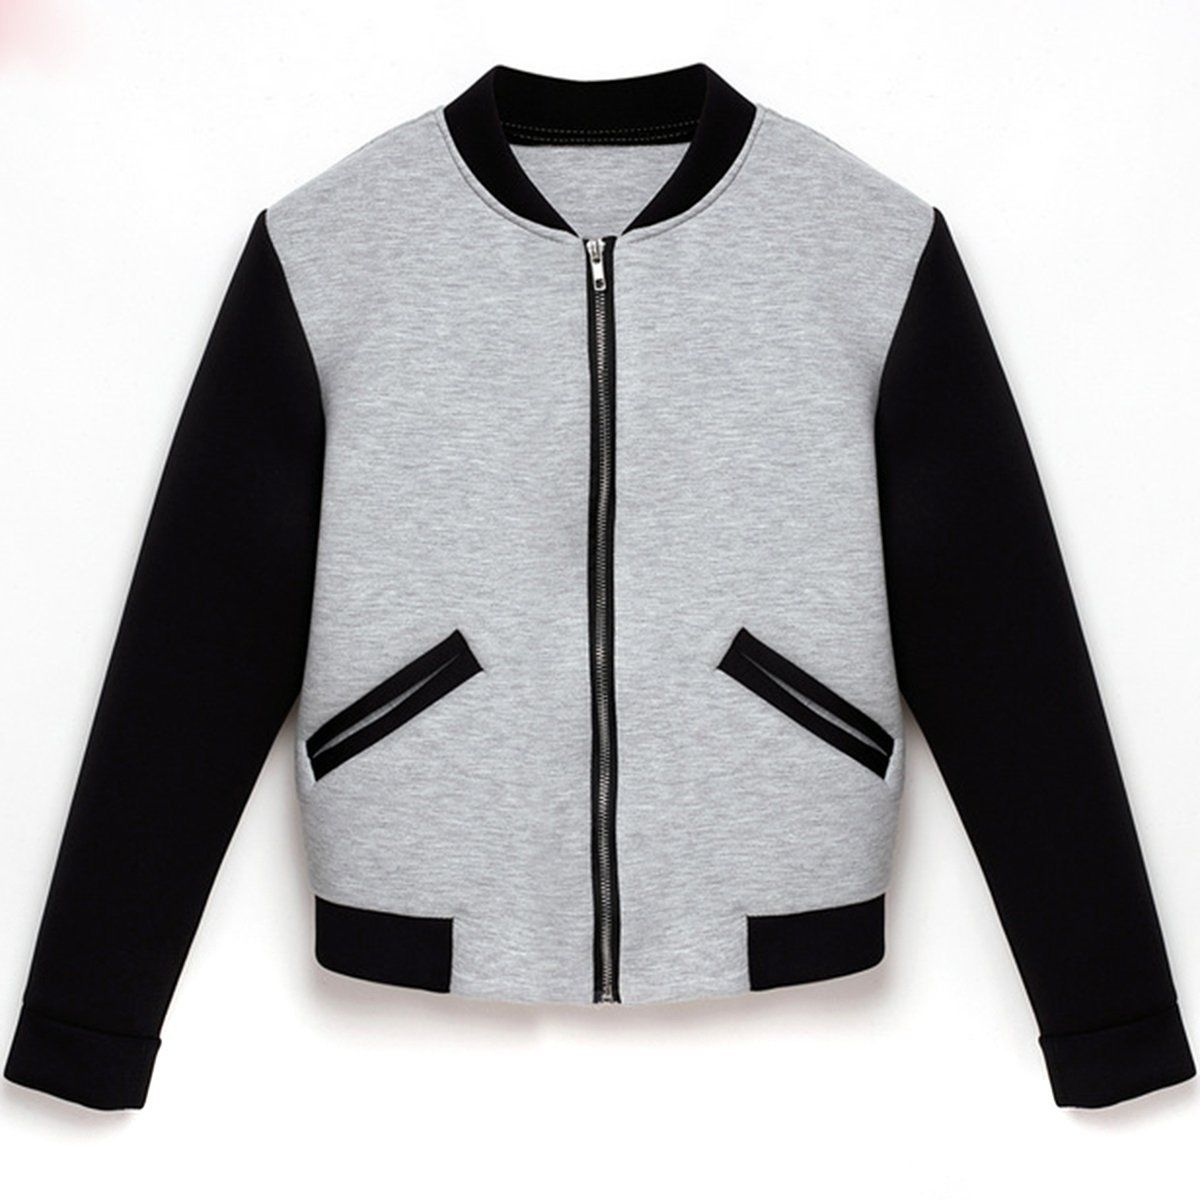 86e78ba7e Puseky 2018 Hot Sale Fashion Womens Bomber Jacket Vintage Zip up Biker  Stylish Padded Zipper Coat Top Blouse Autumn Winter Coats